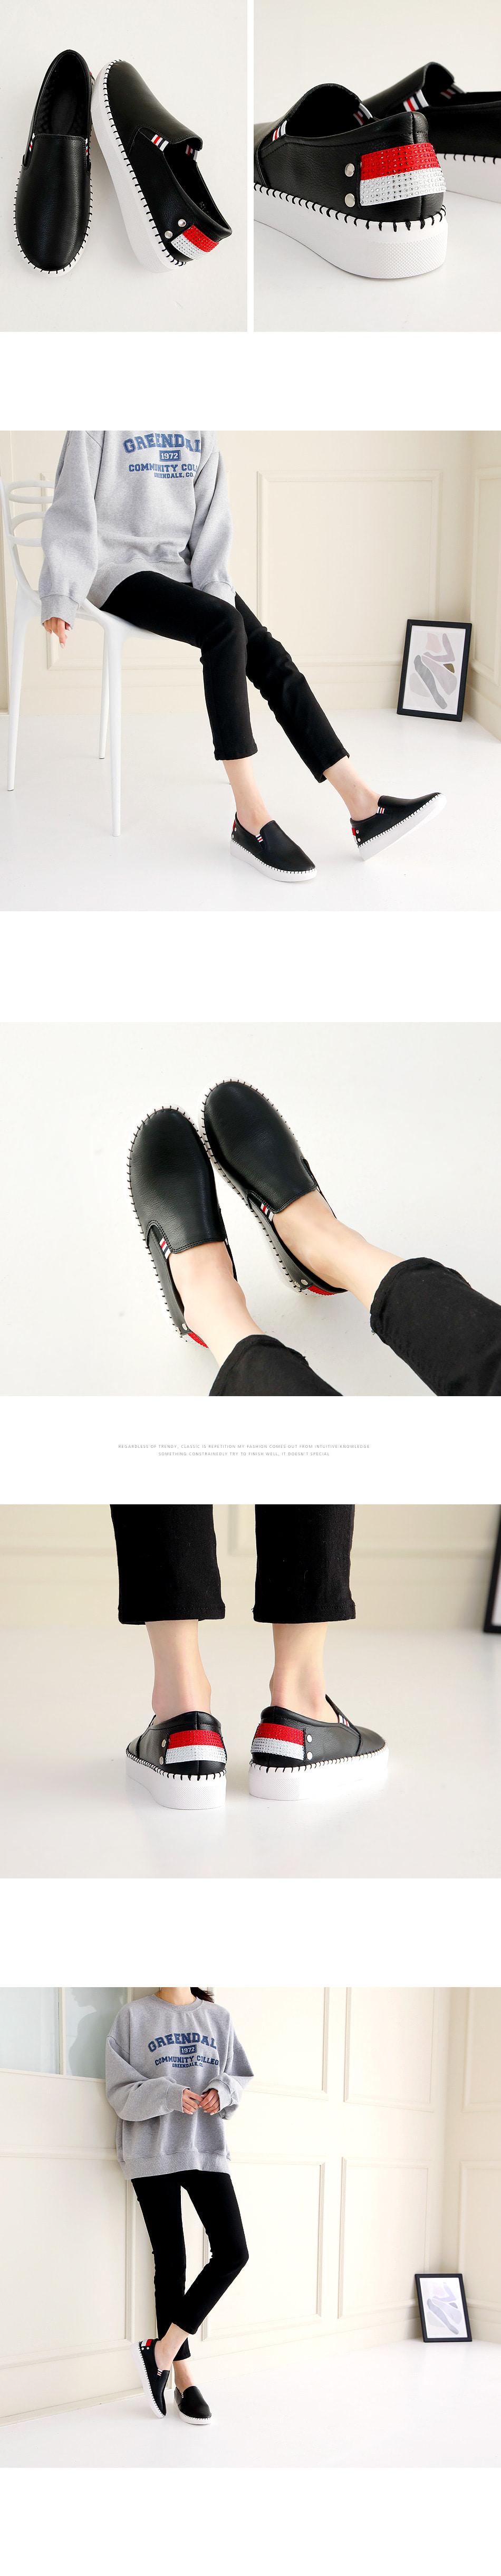 Pallet leather height long heel slip-on 4cm